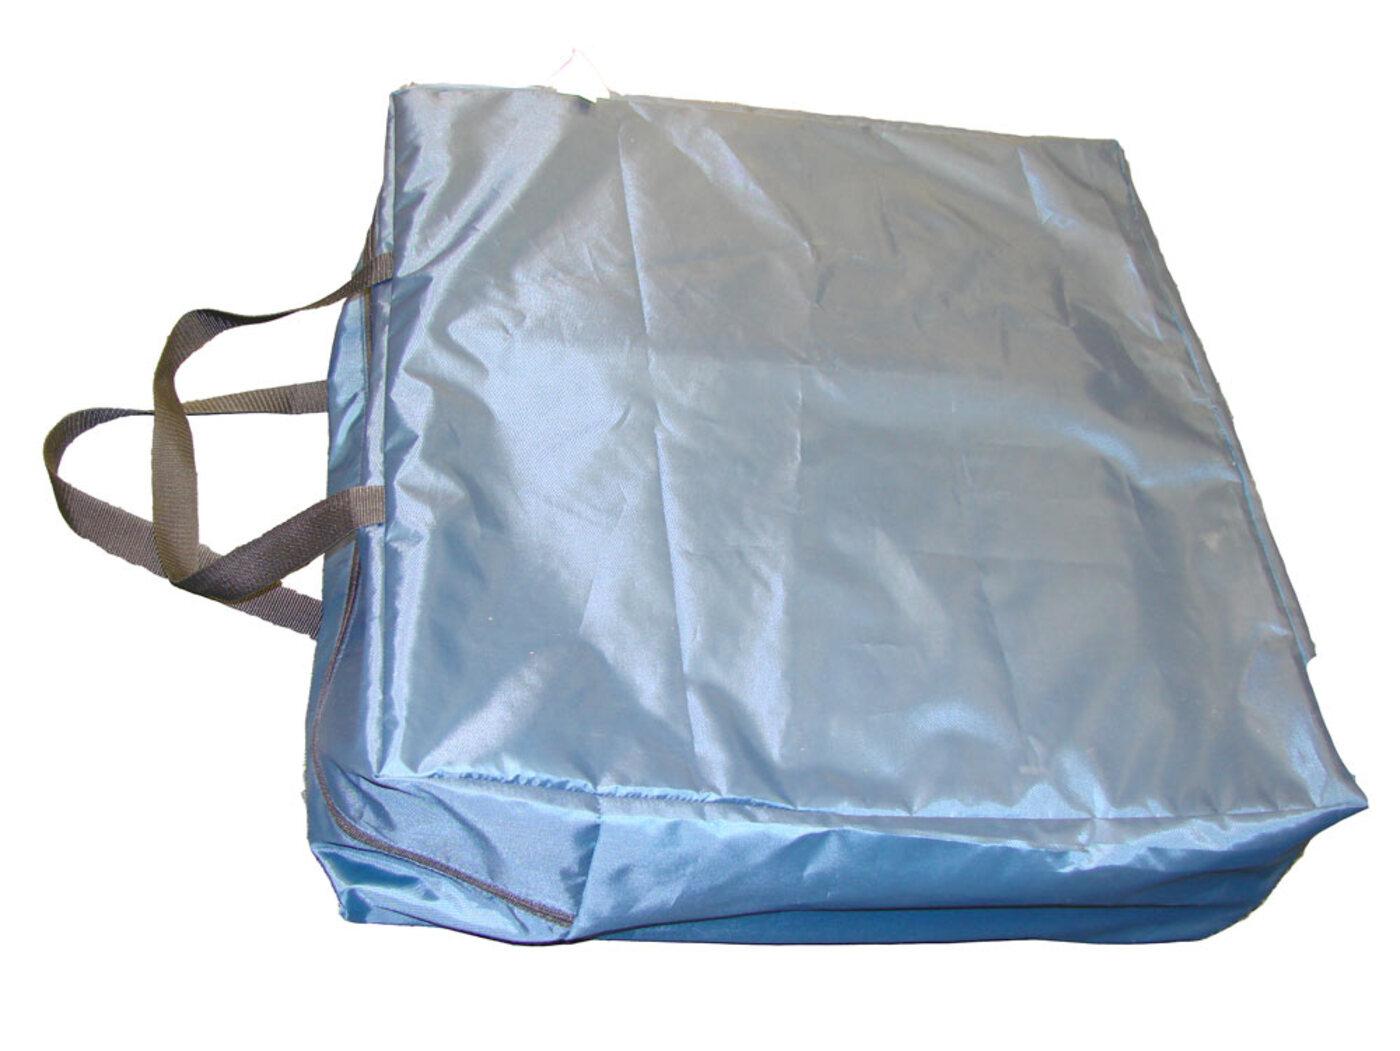 Maypole Awning Floor Tile Storage Bag Homestead Caravans